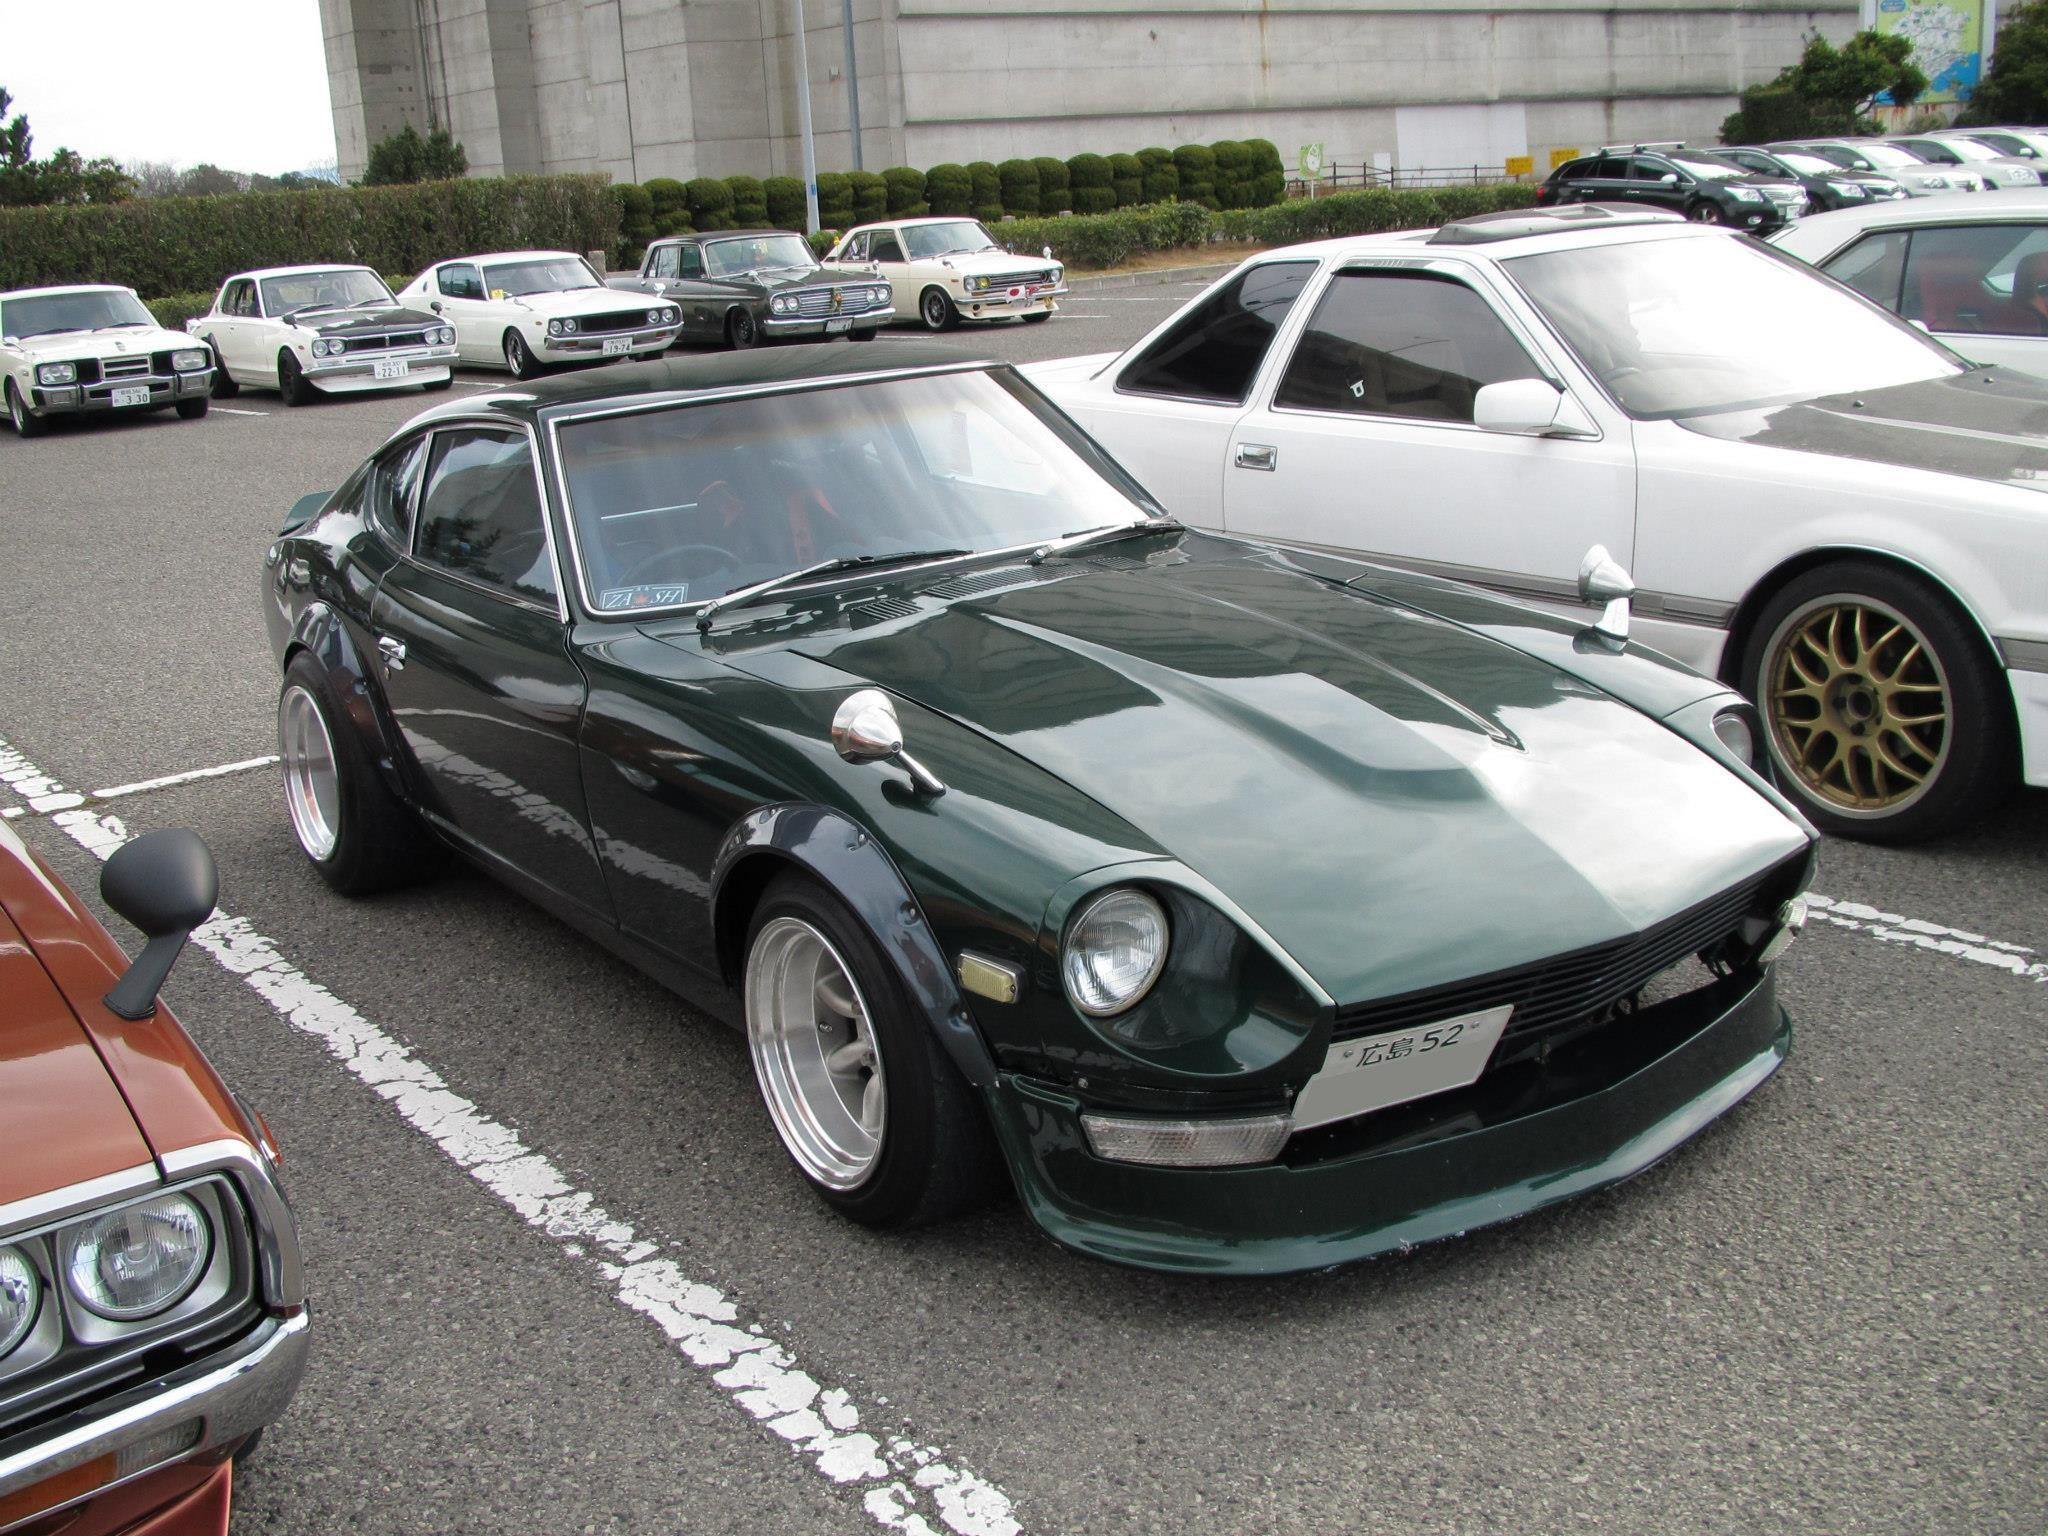 240z Looks good in dark green | 240z | Pinterest | Cars ...